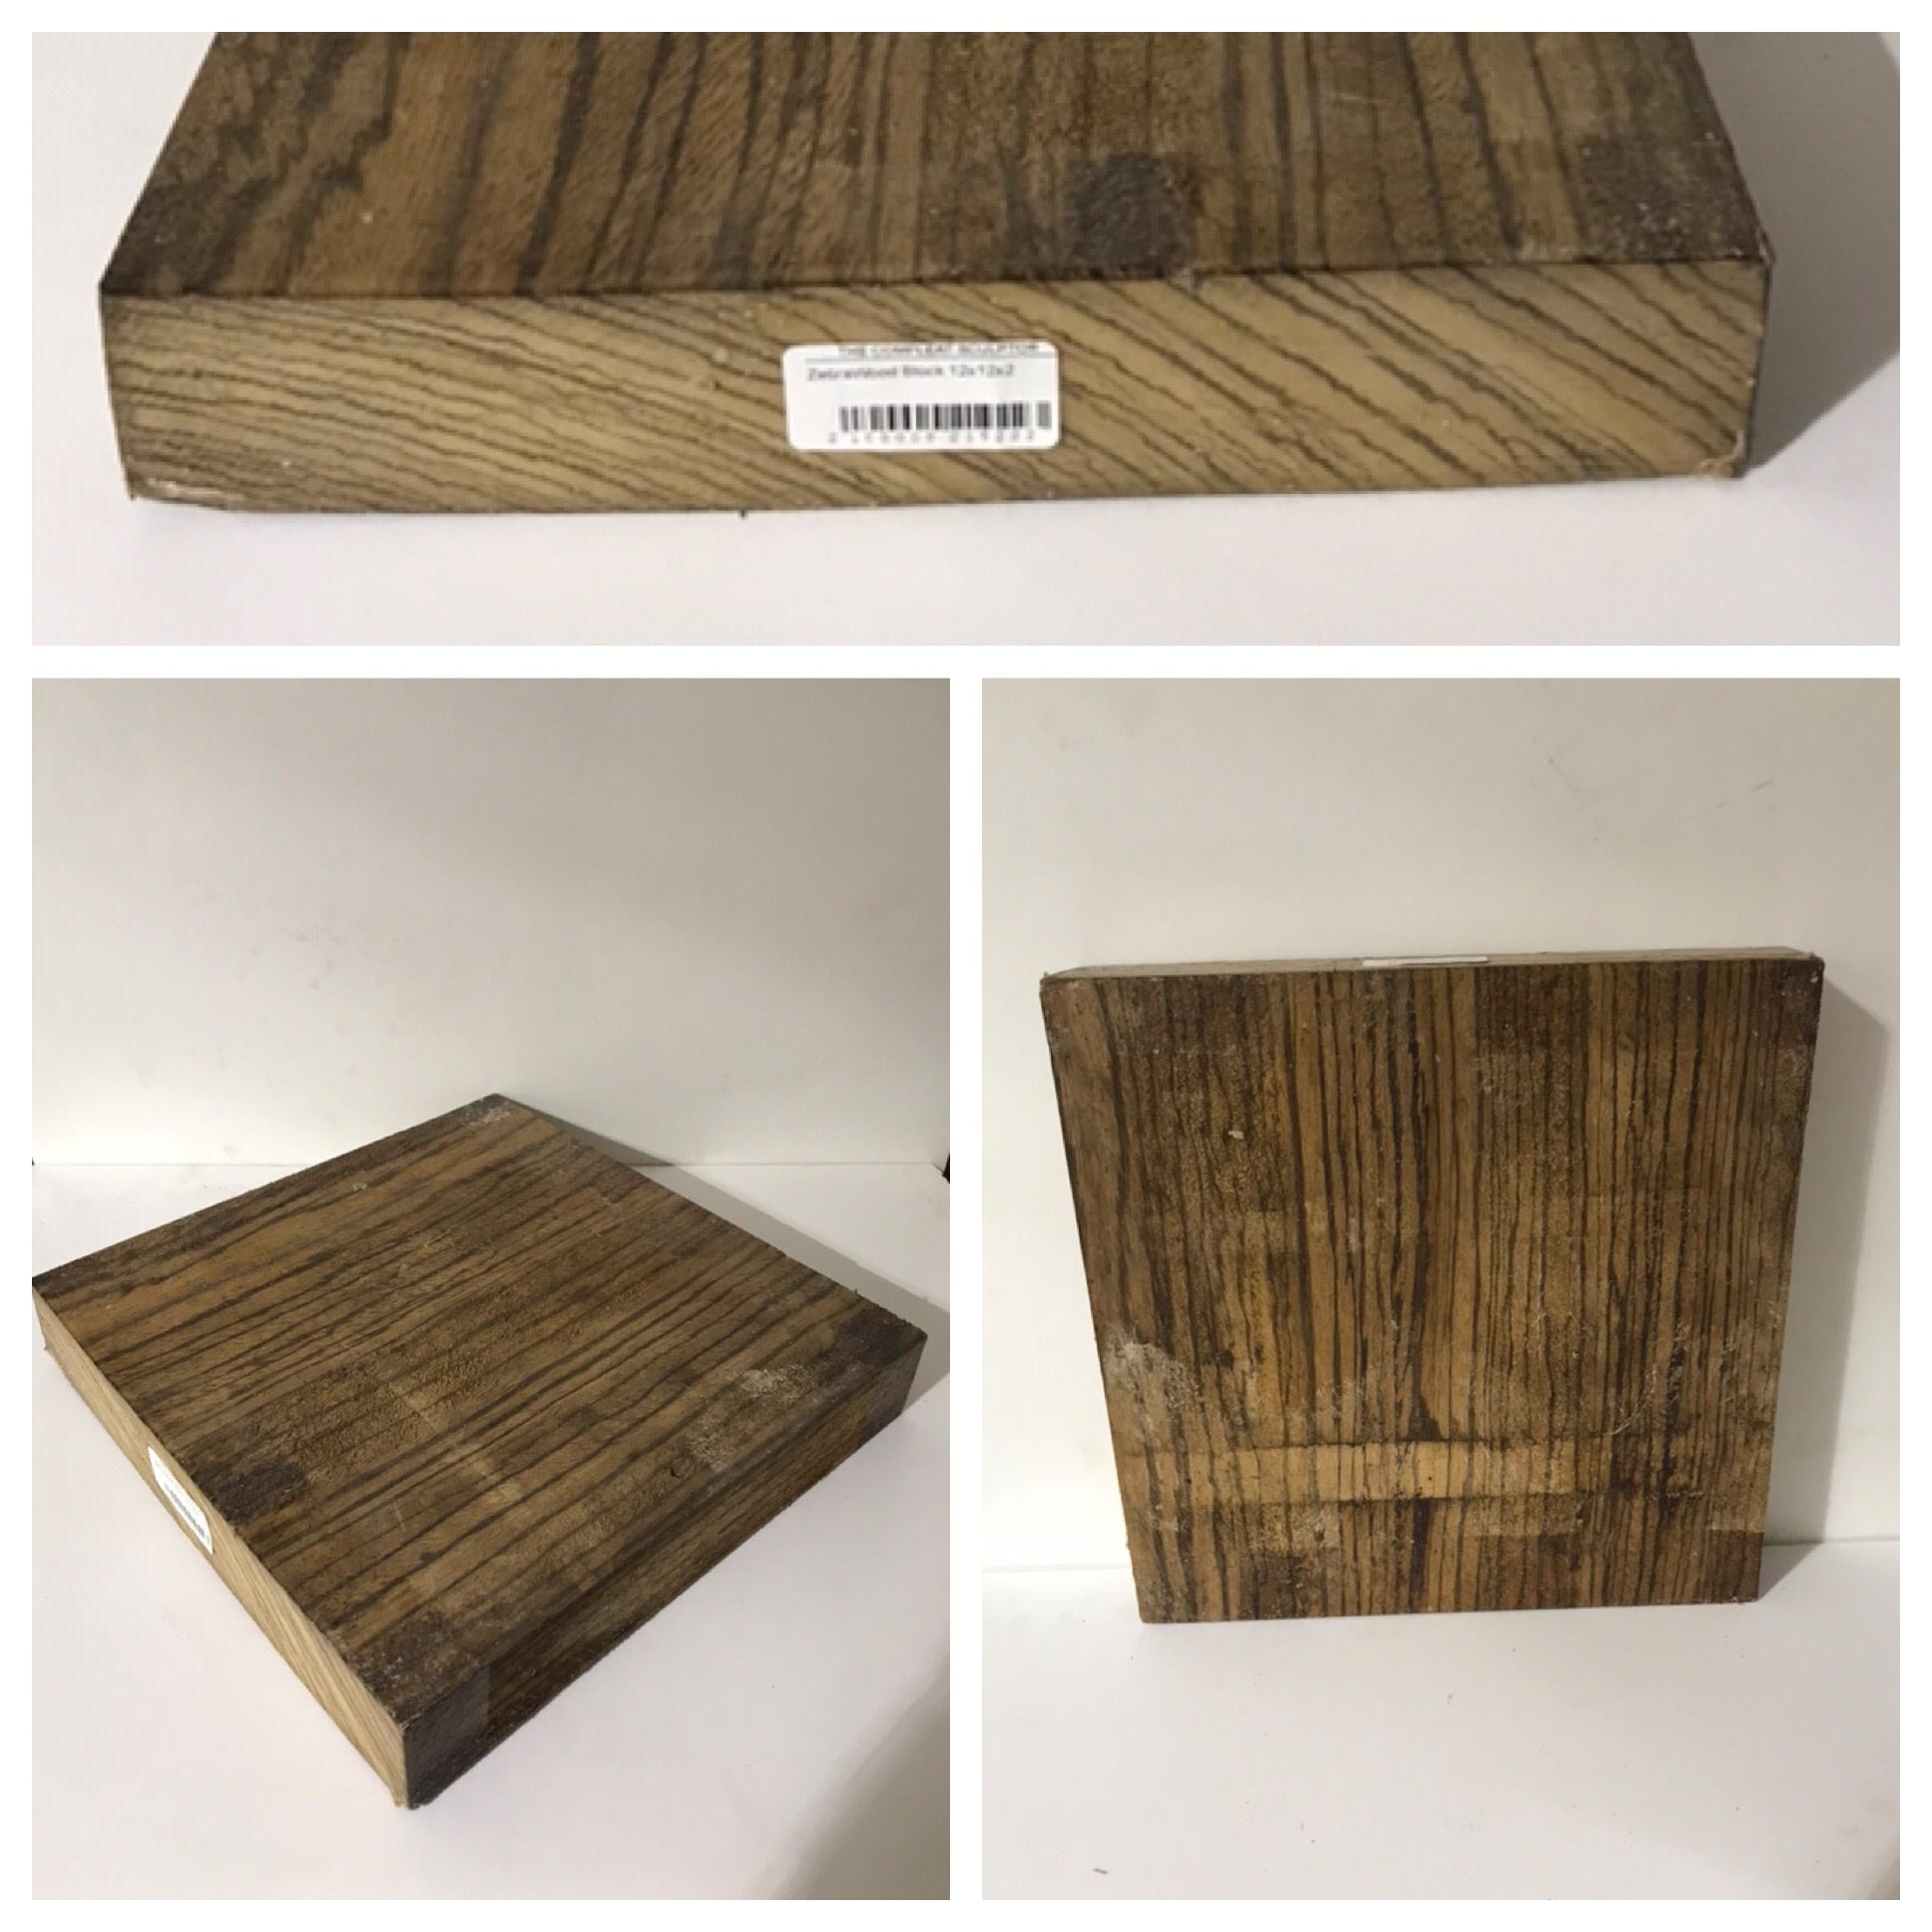 Wood ZebraWood Block 12x12x2